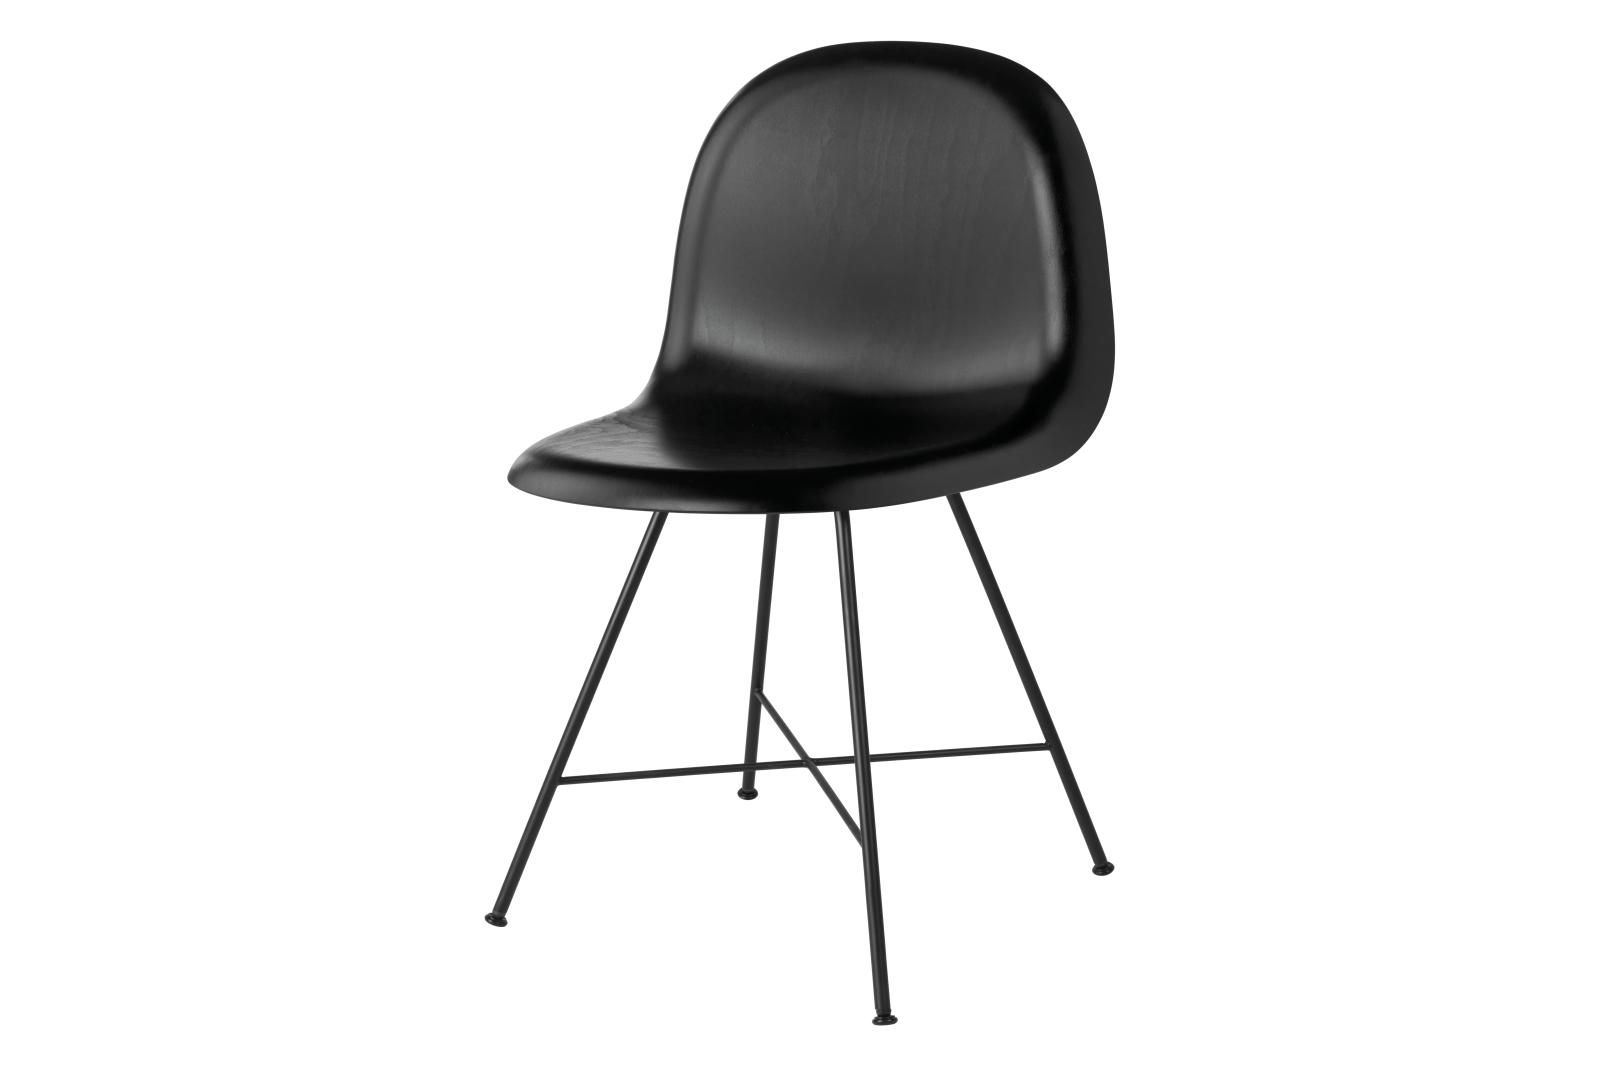 3D Dining Chair - Un-Upholstered, Center Base Gubi Wood Black Stained Beech, Felt Glides